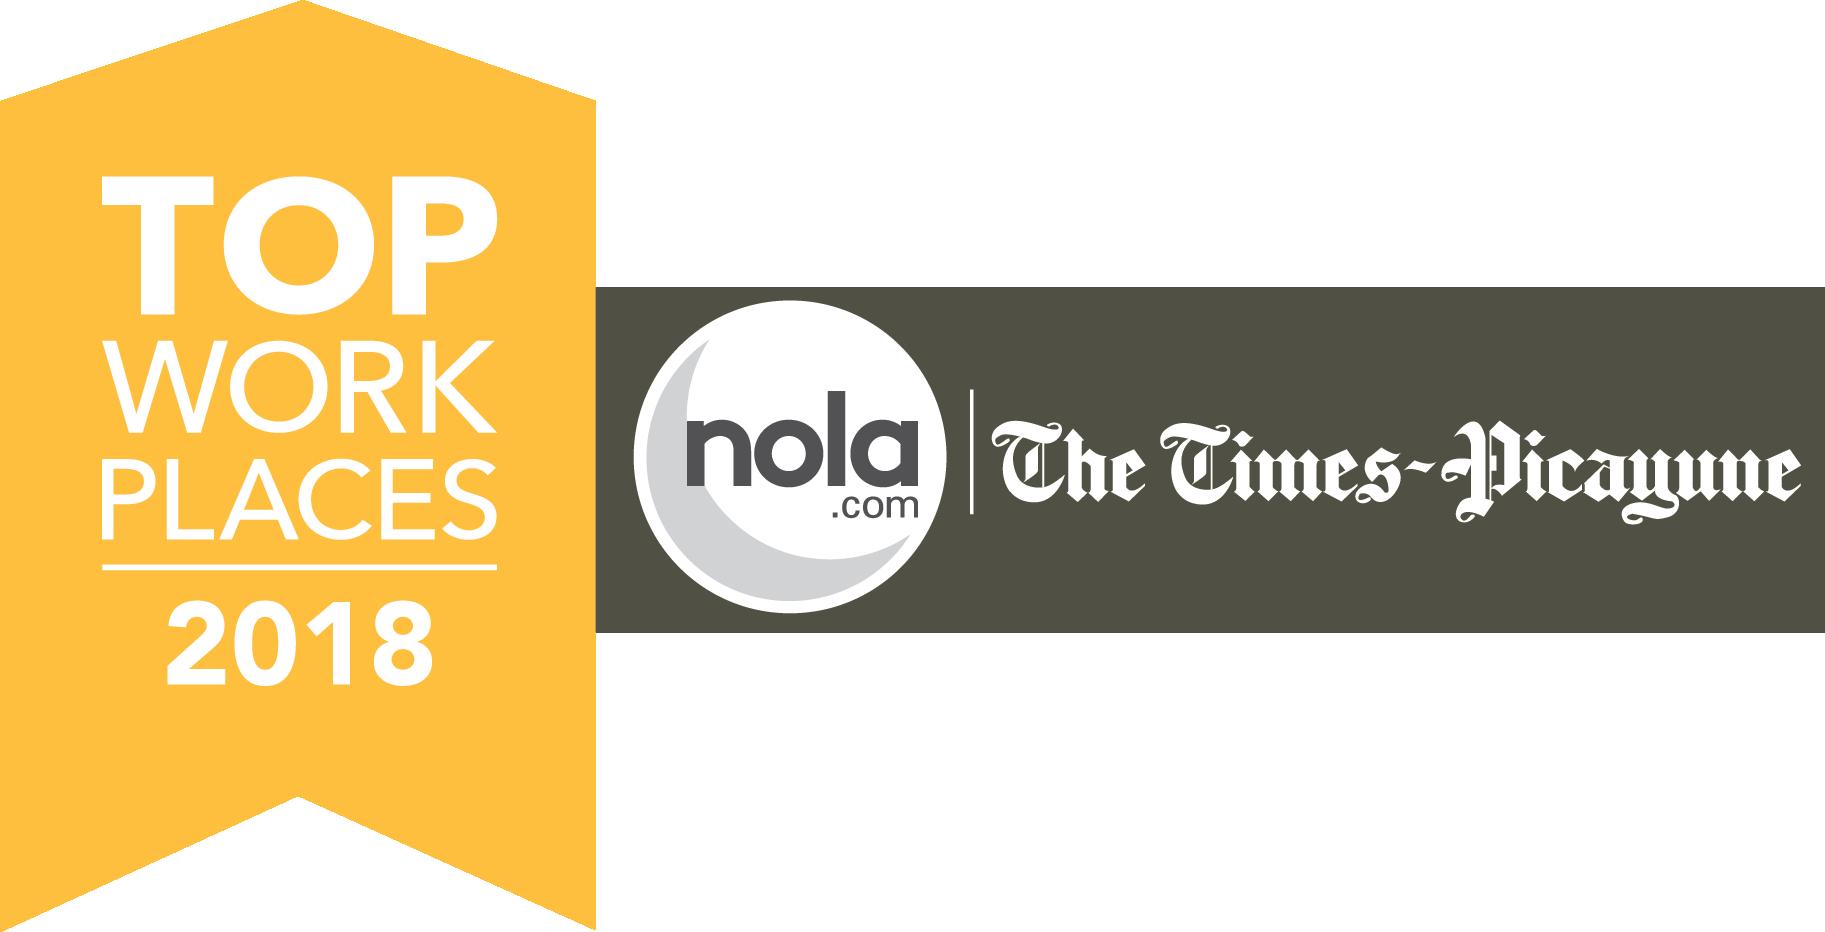 Louisiana FCU receives the Top Workplace of 2018 Award